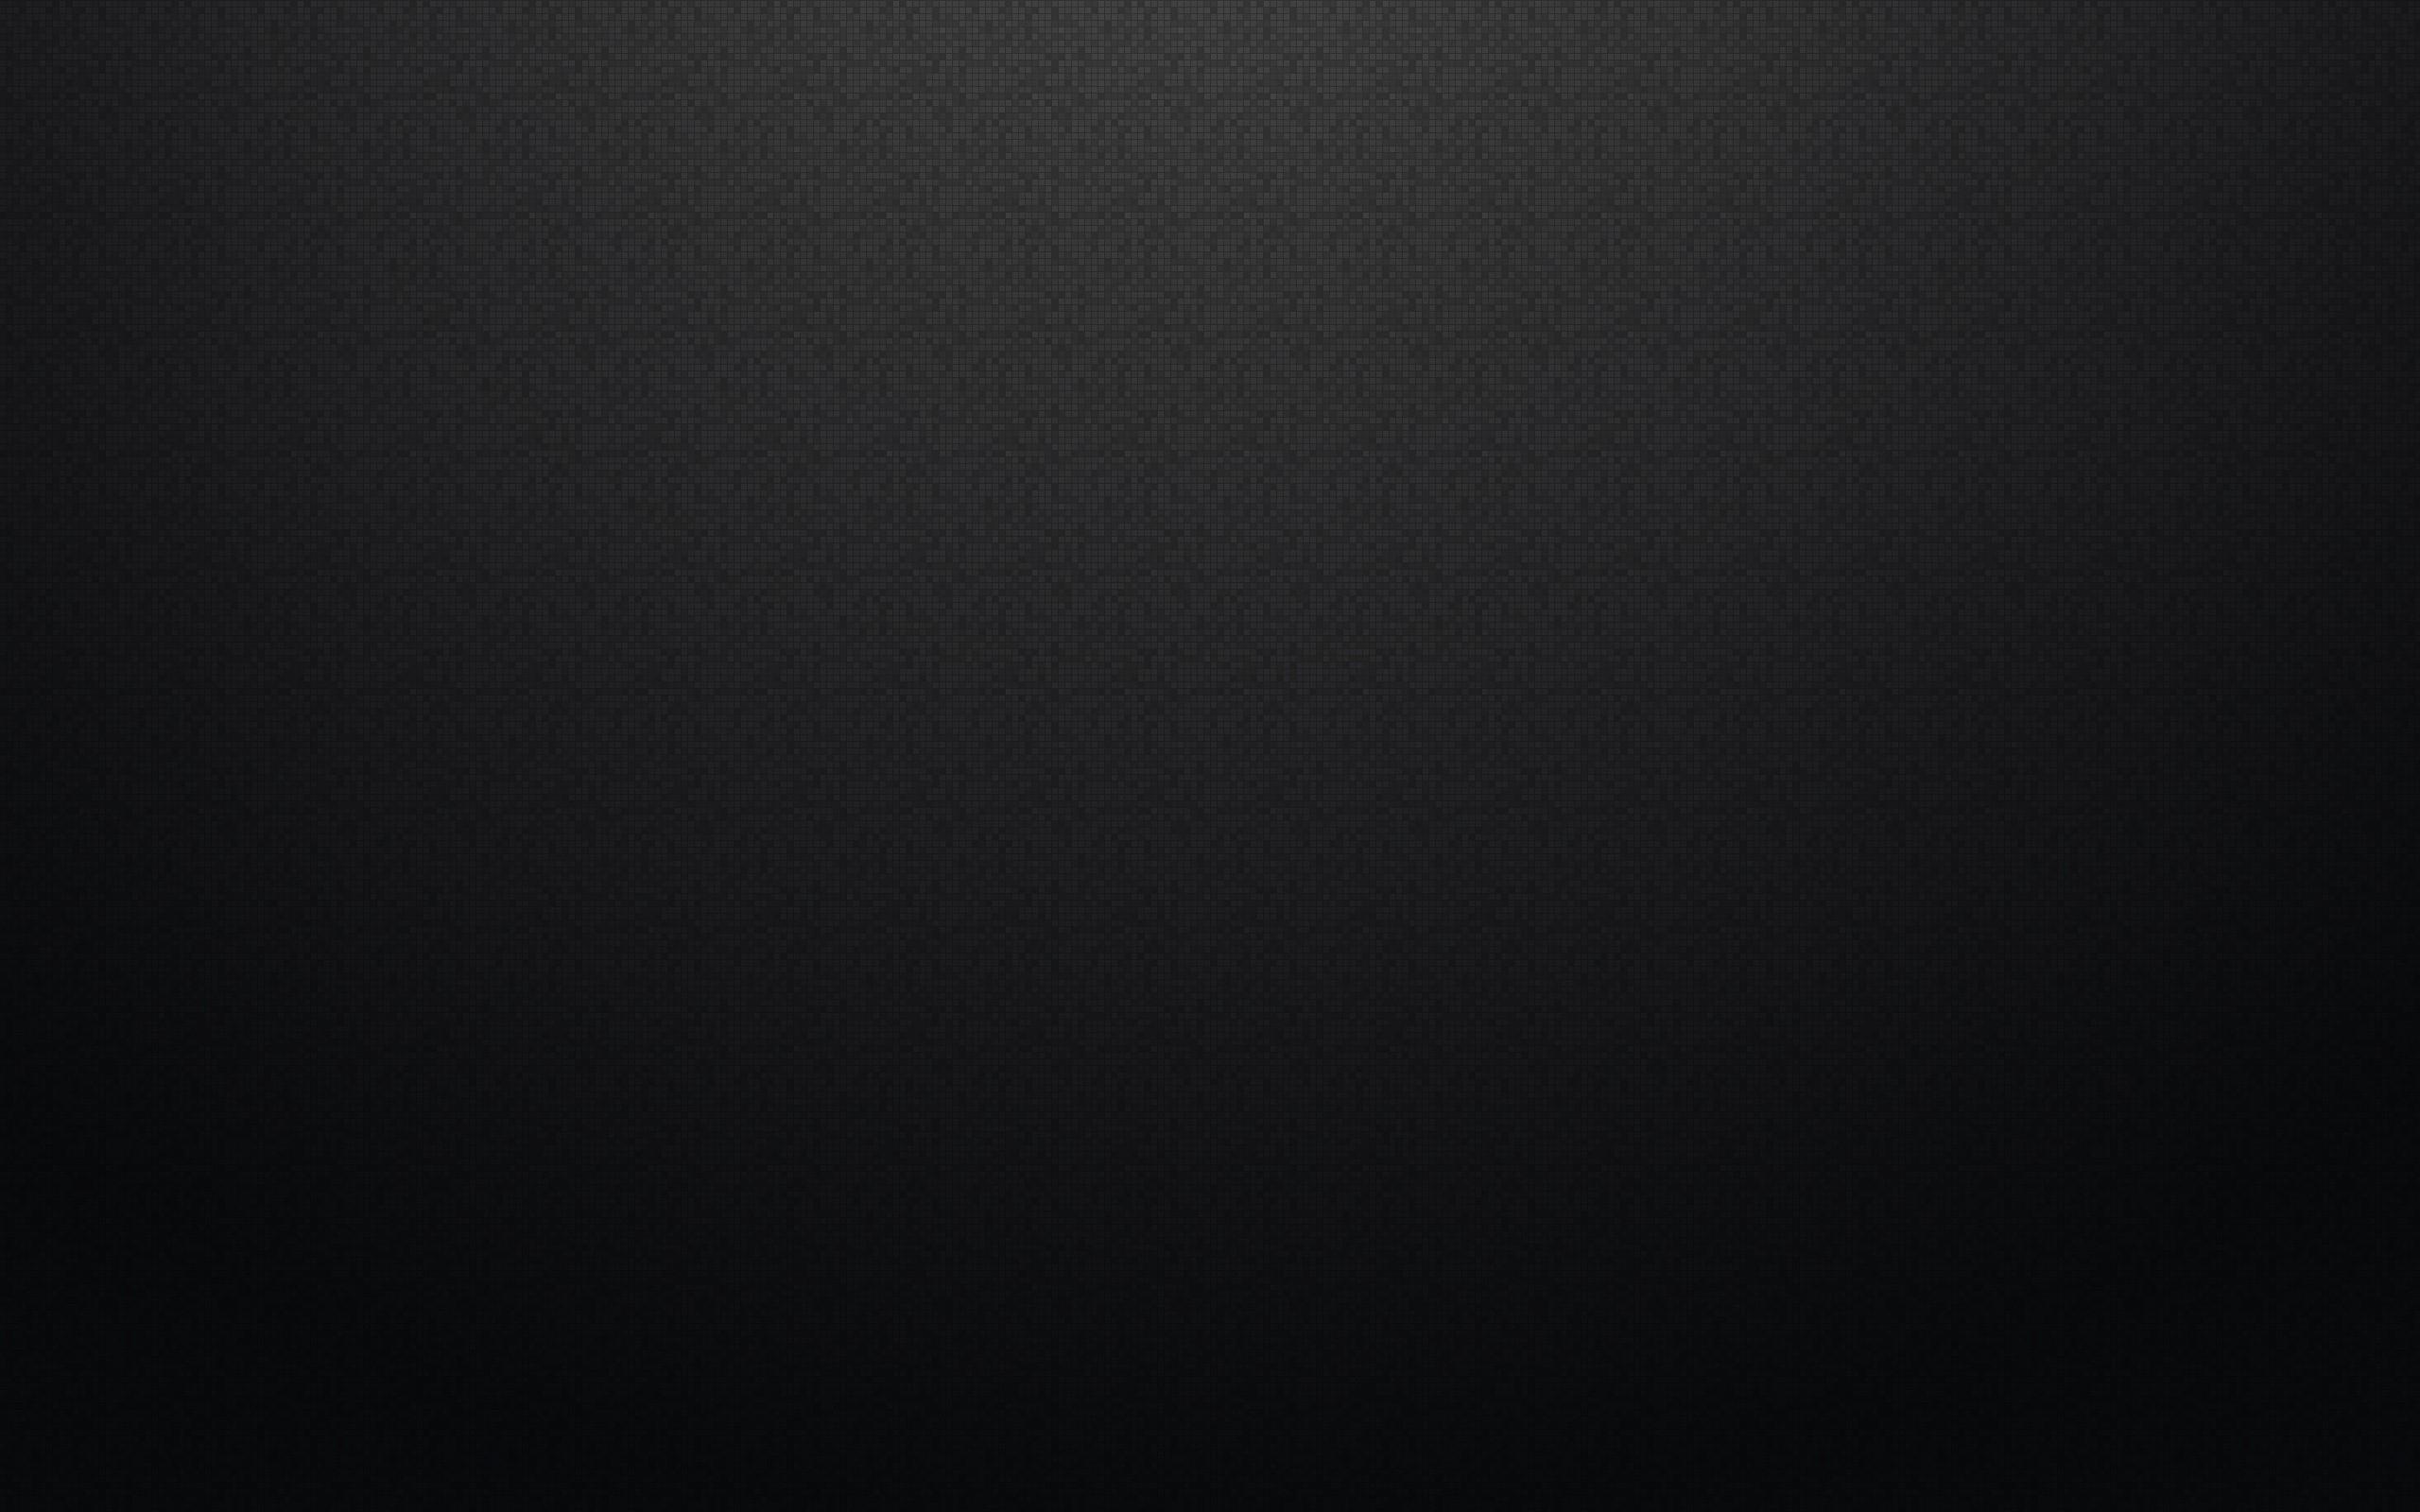 … solid black wallpaper for android wallpapersafari solid black …